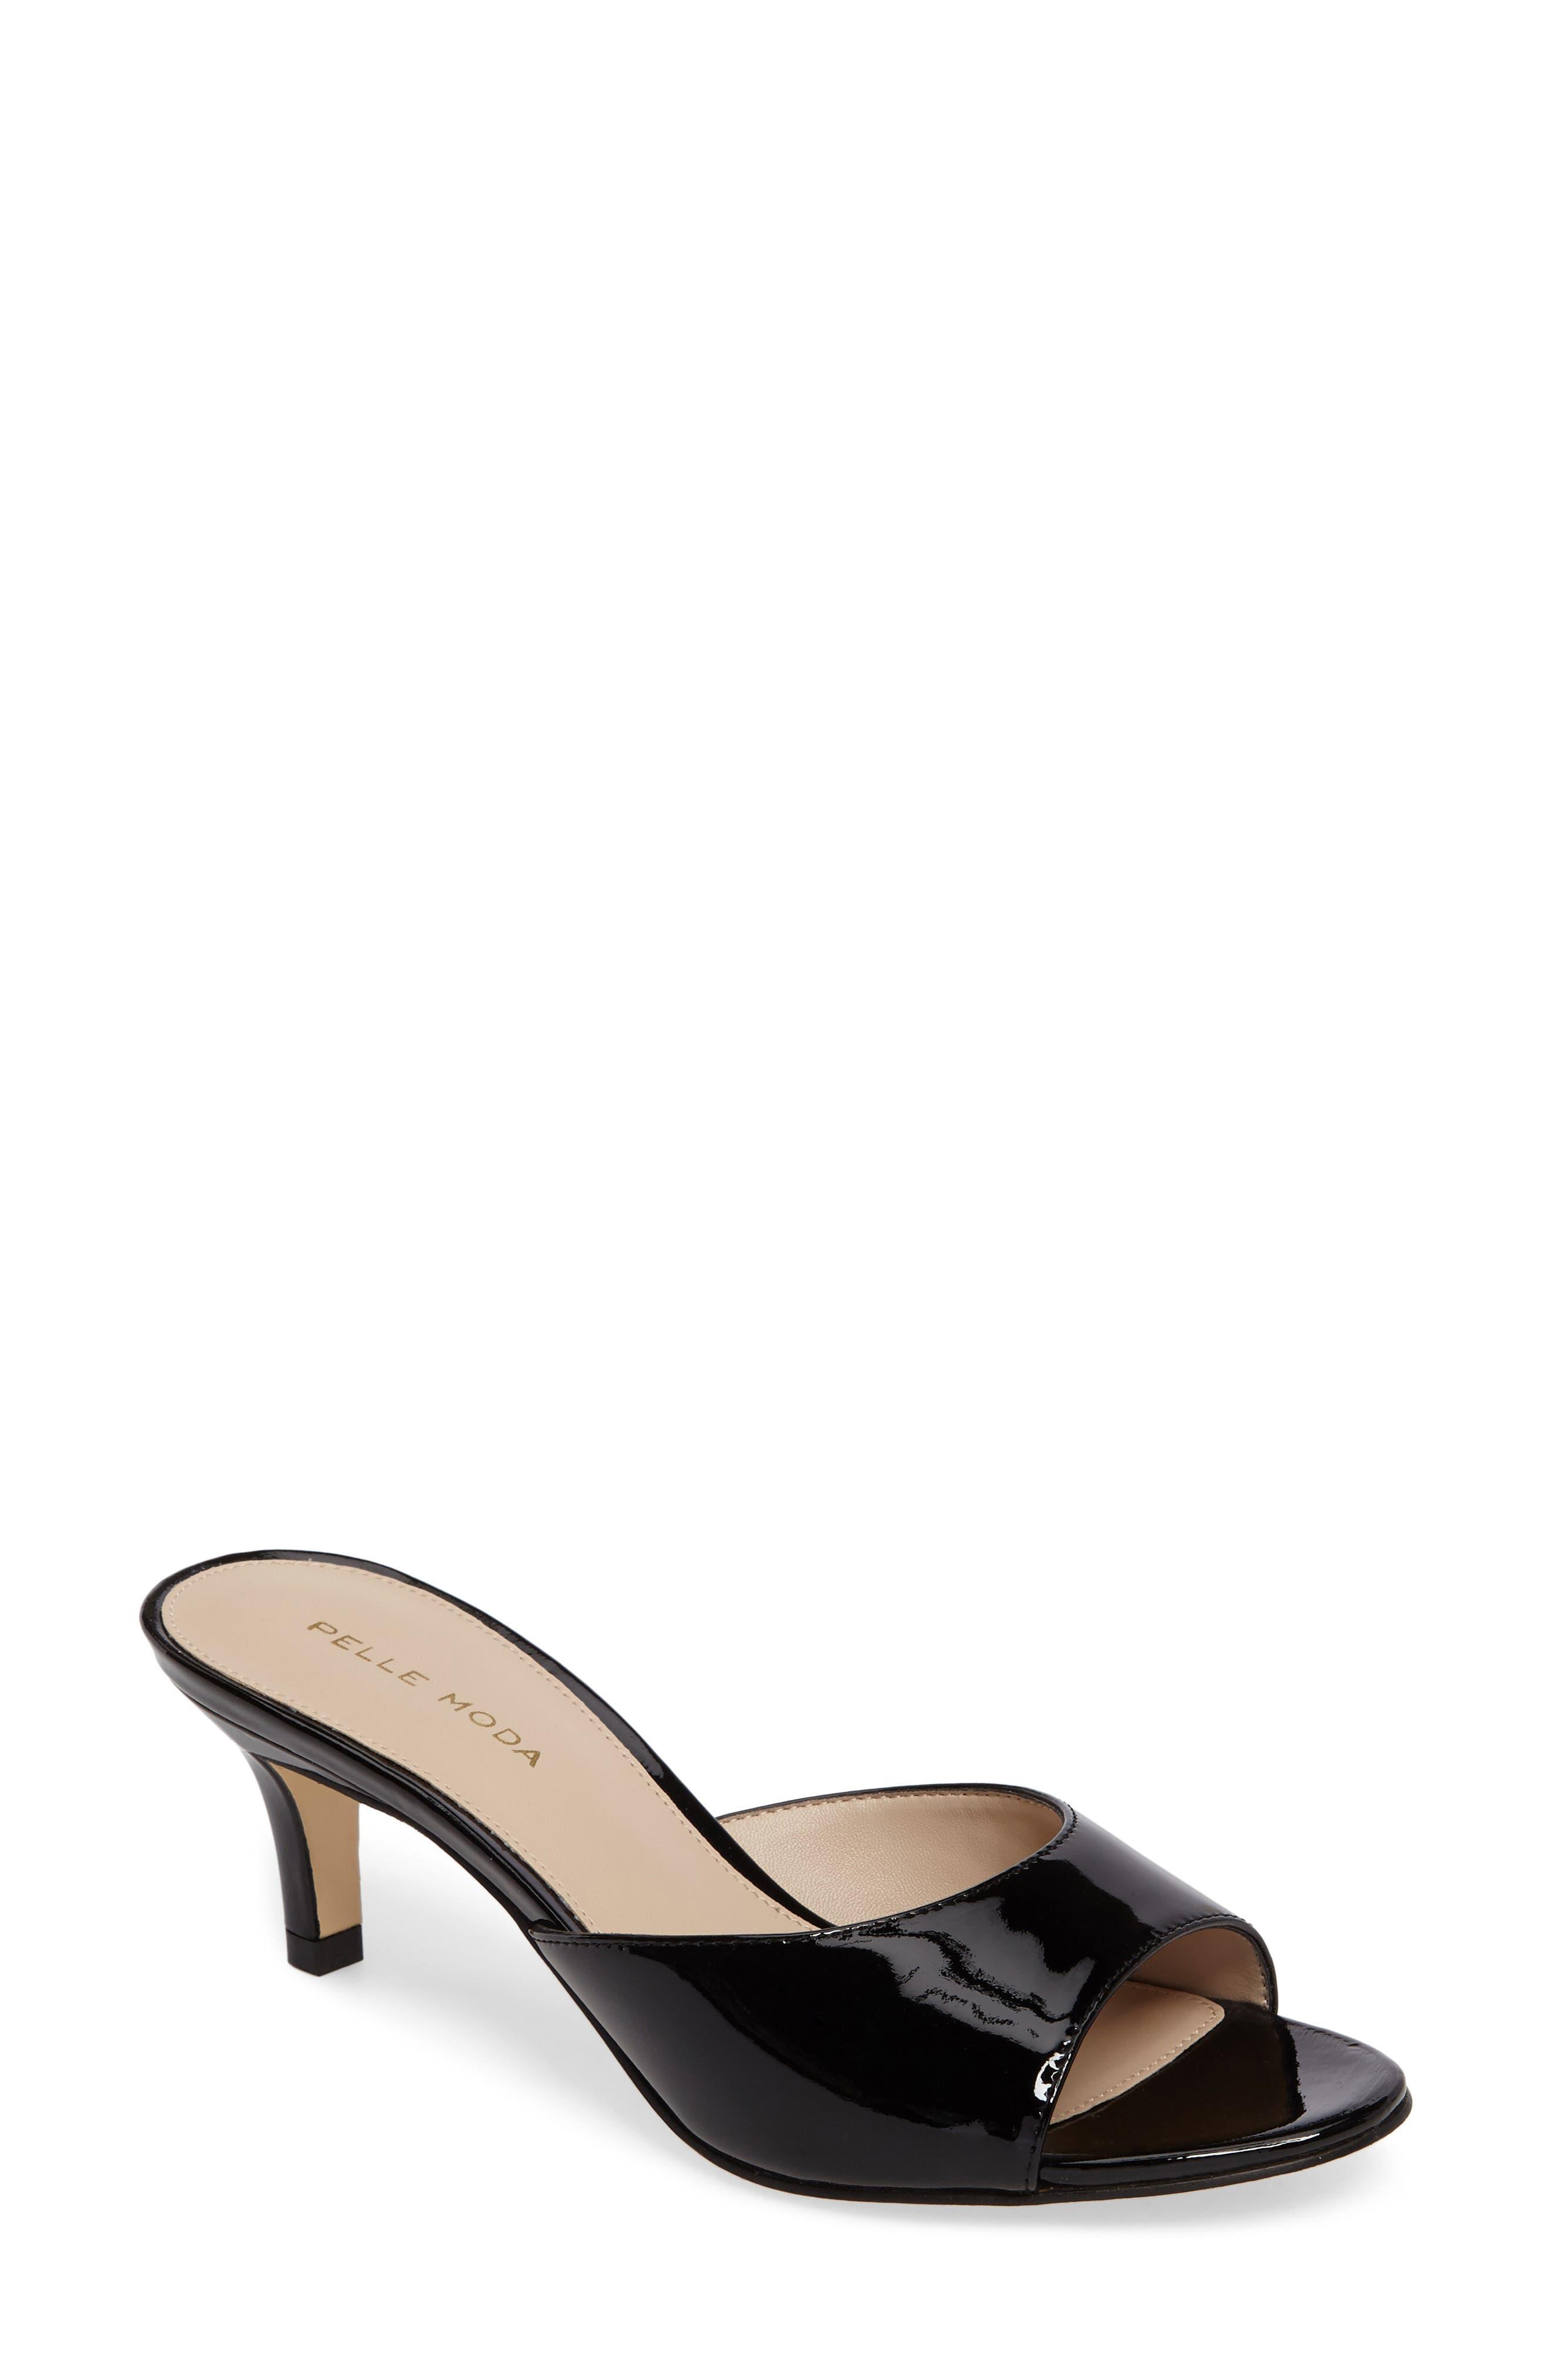 Pelle Moda Bex Kitten Heel Slide (Women)